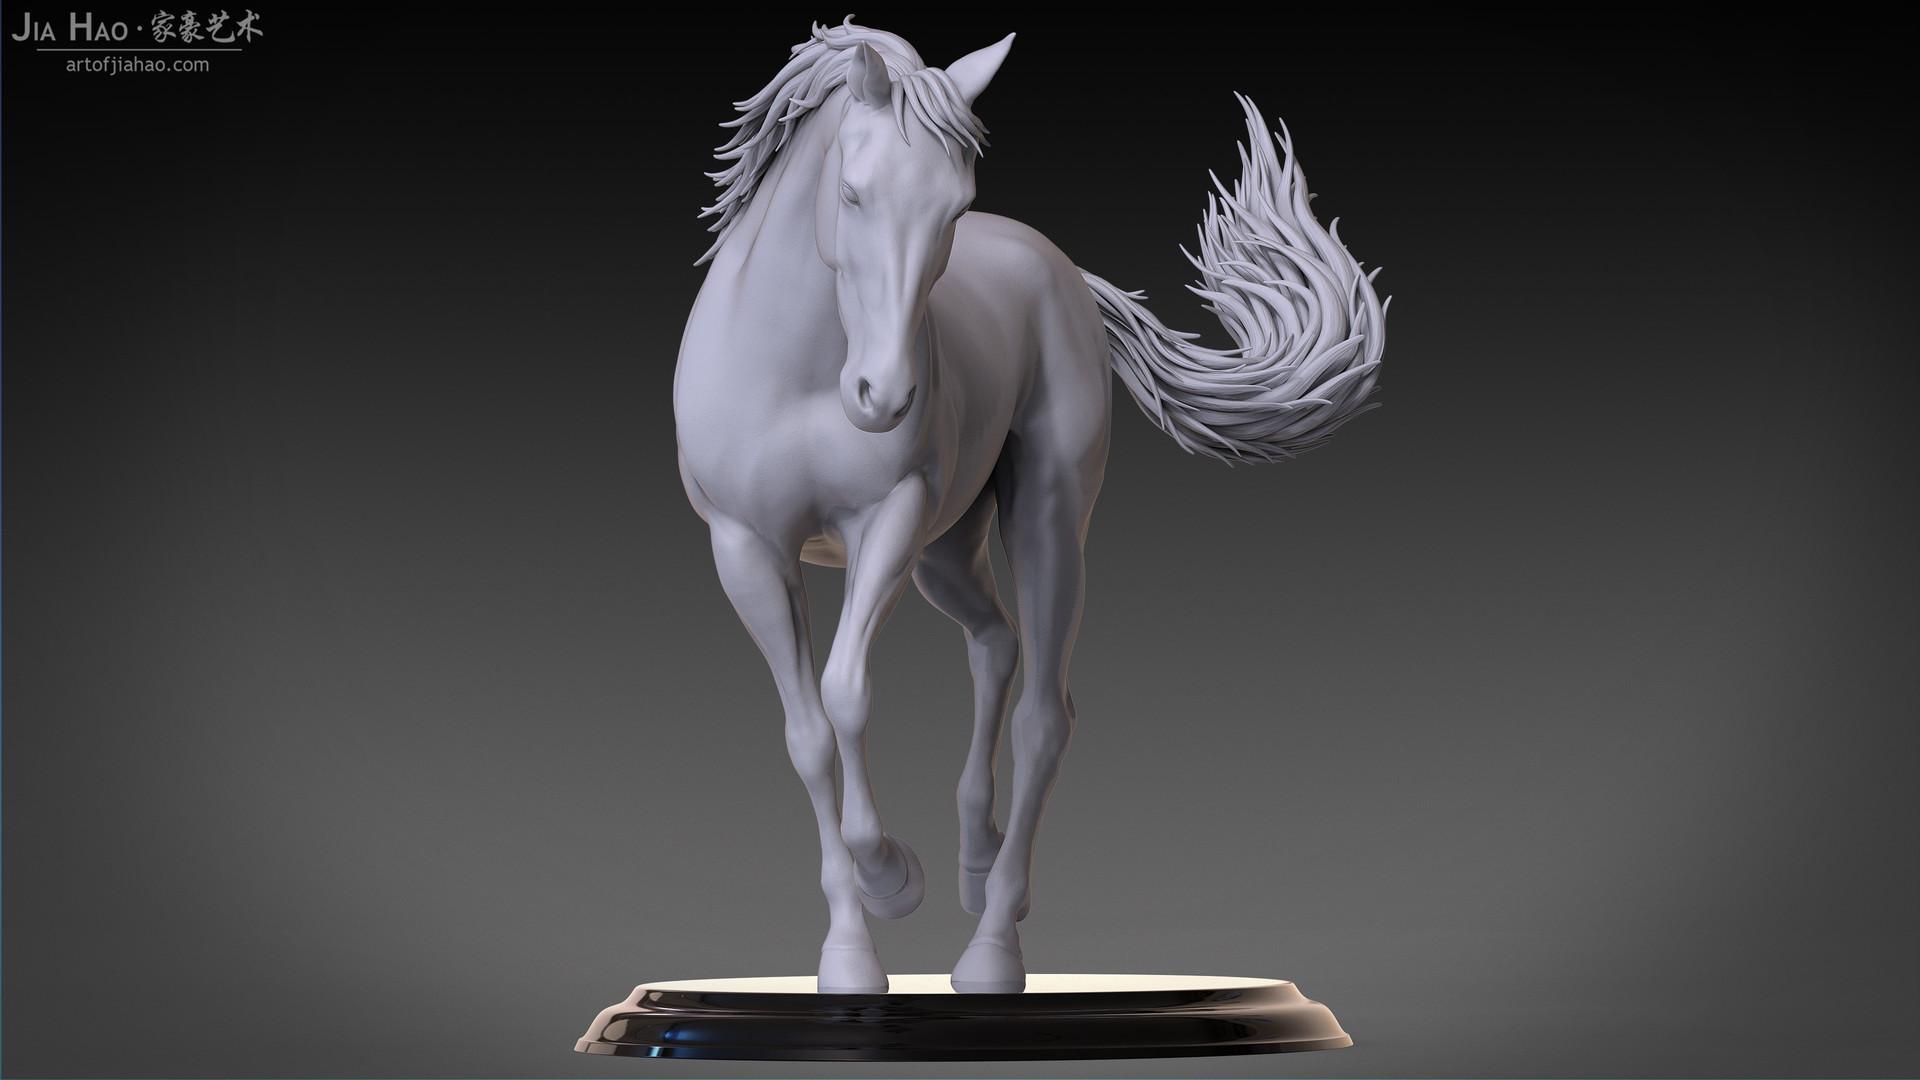 Jia hao horse sculpture comp clay 02